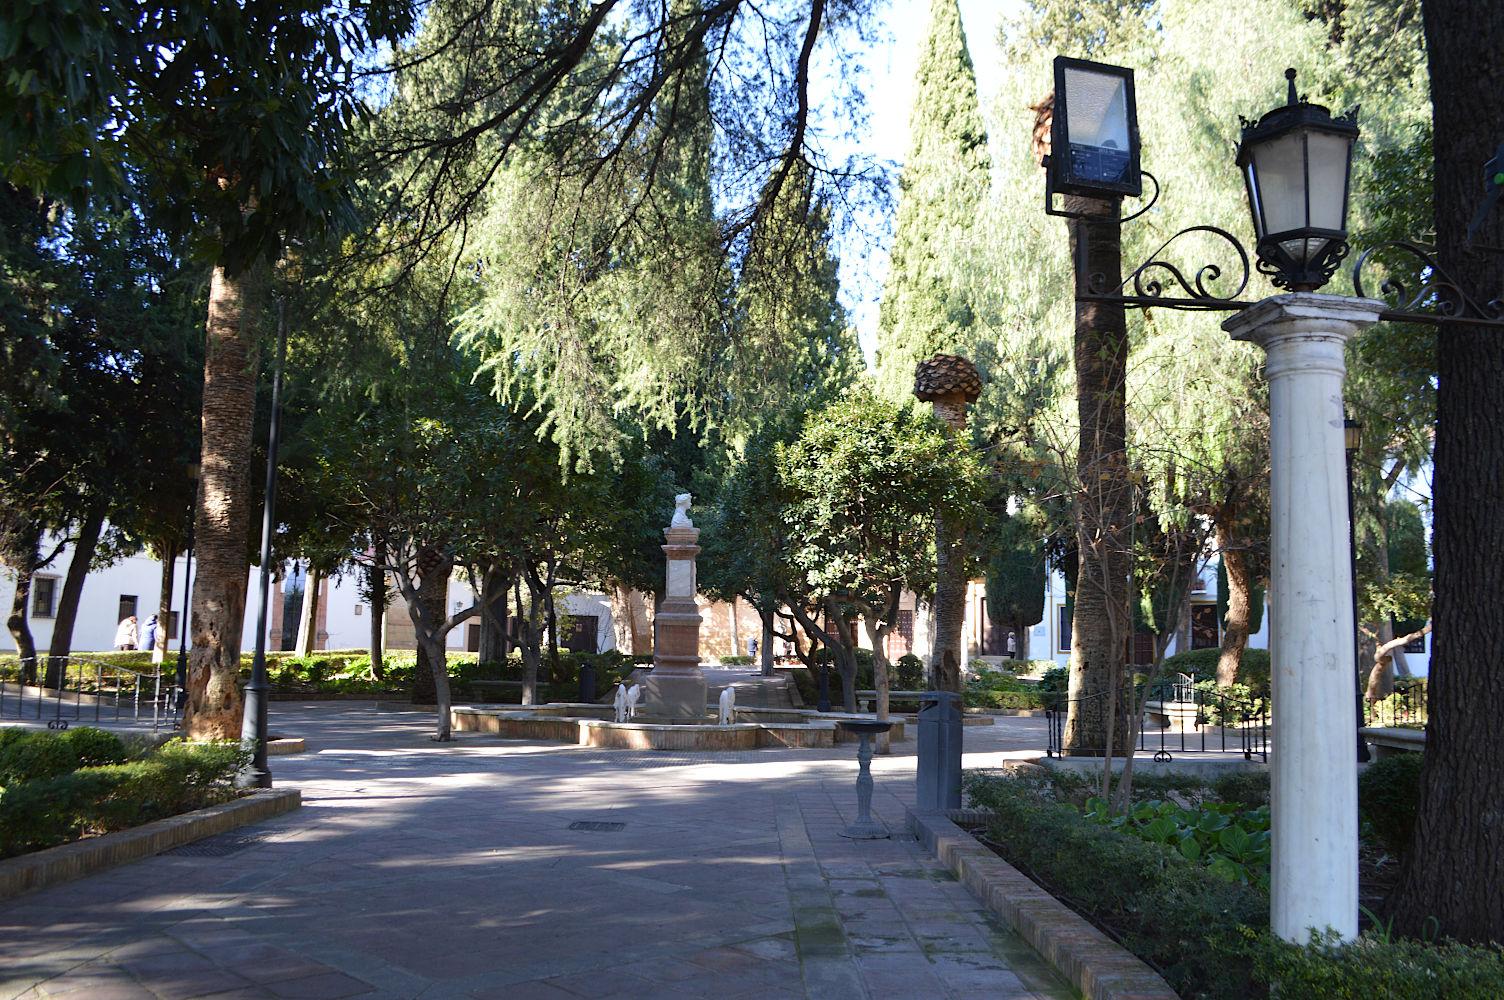 Plaza Duquesa de Parcent